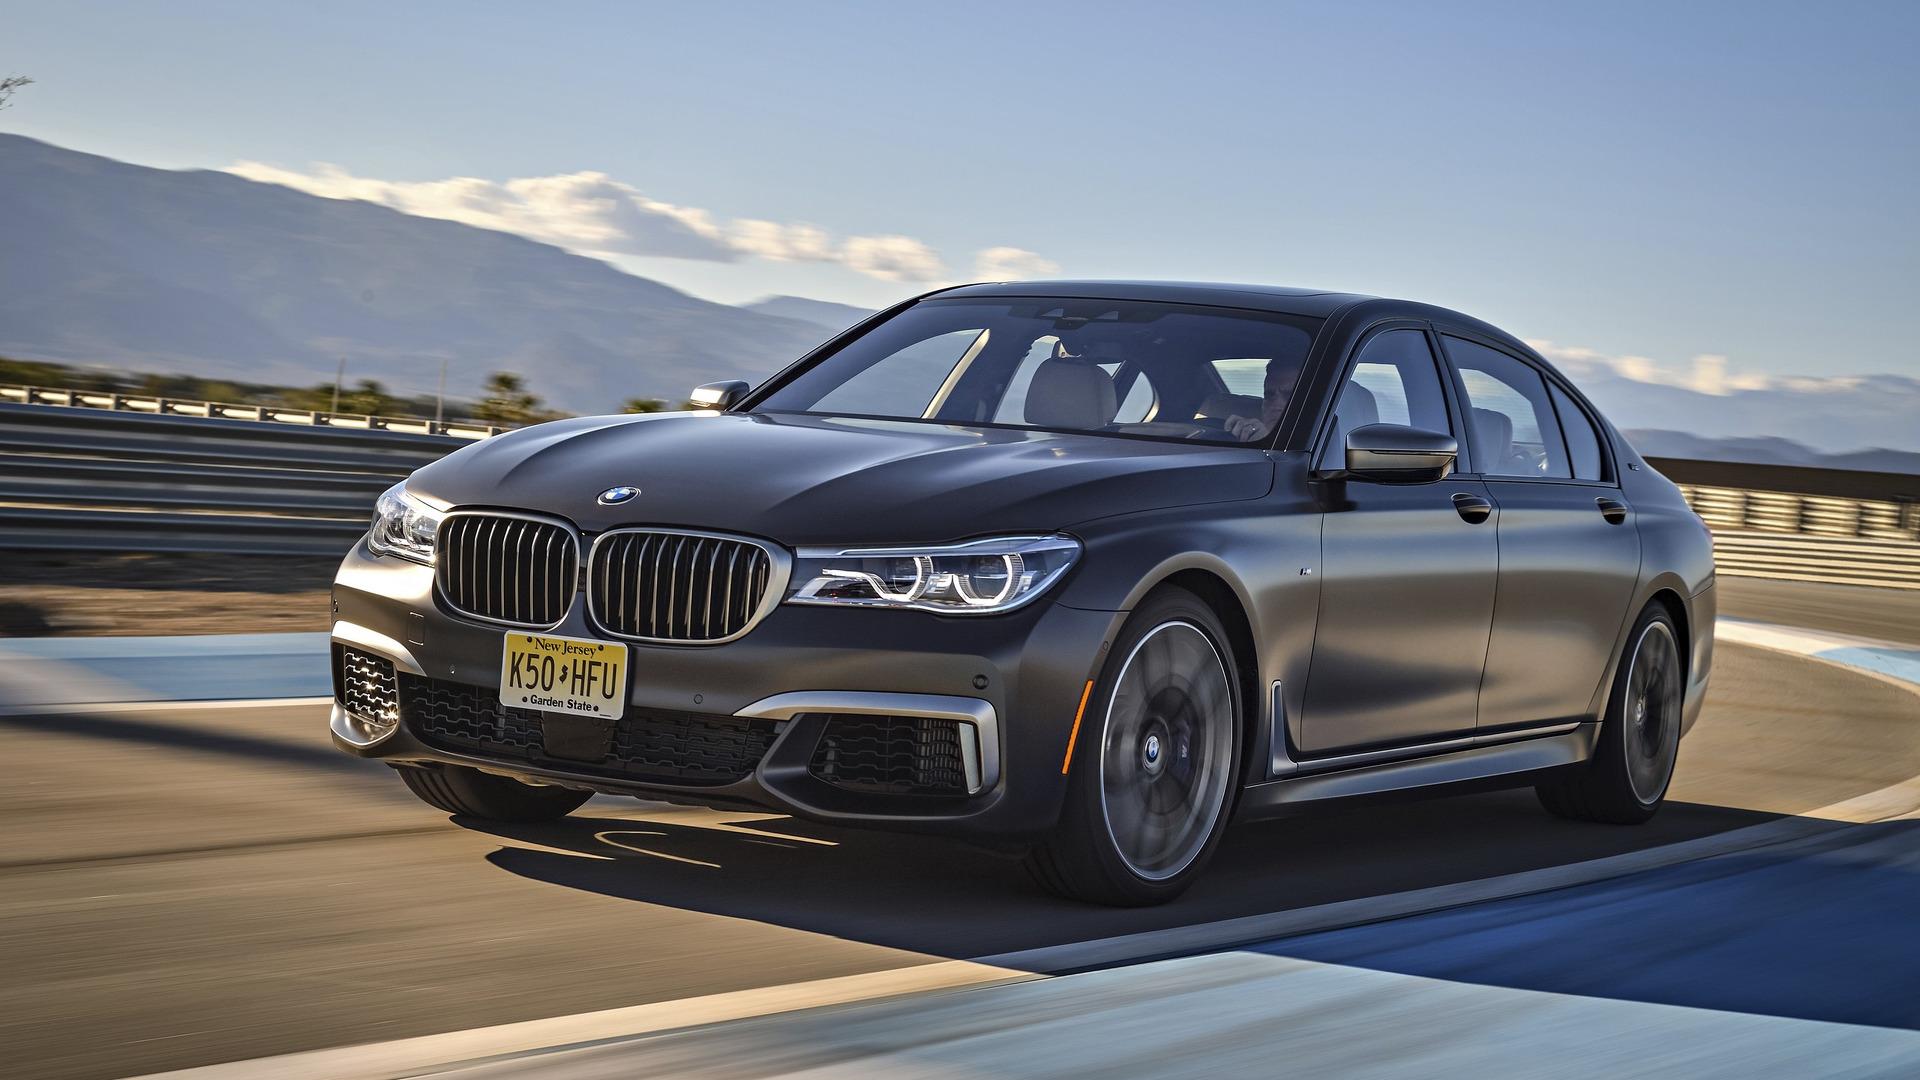 The-BMW-M760Li-xDrive-is-the-pinnacle-of-7-Series-awesomeness-28.jpg